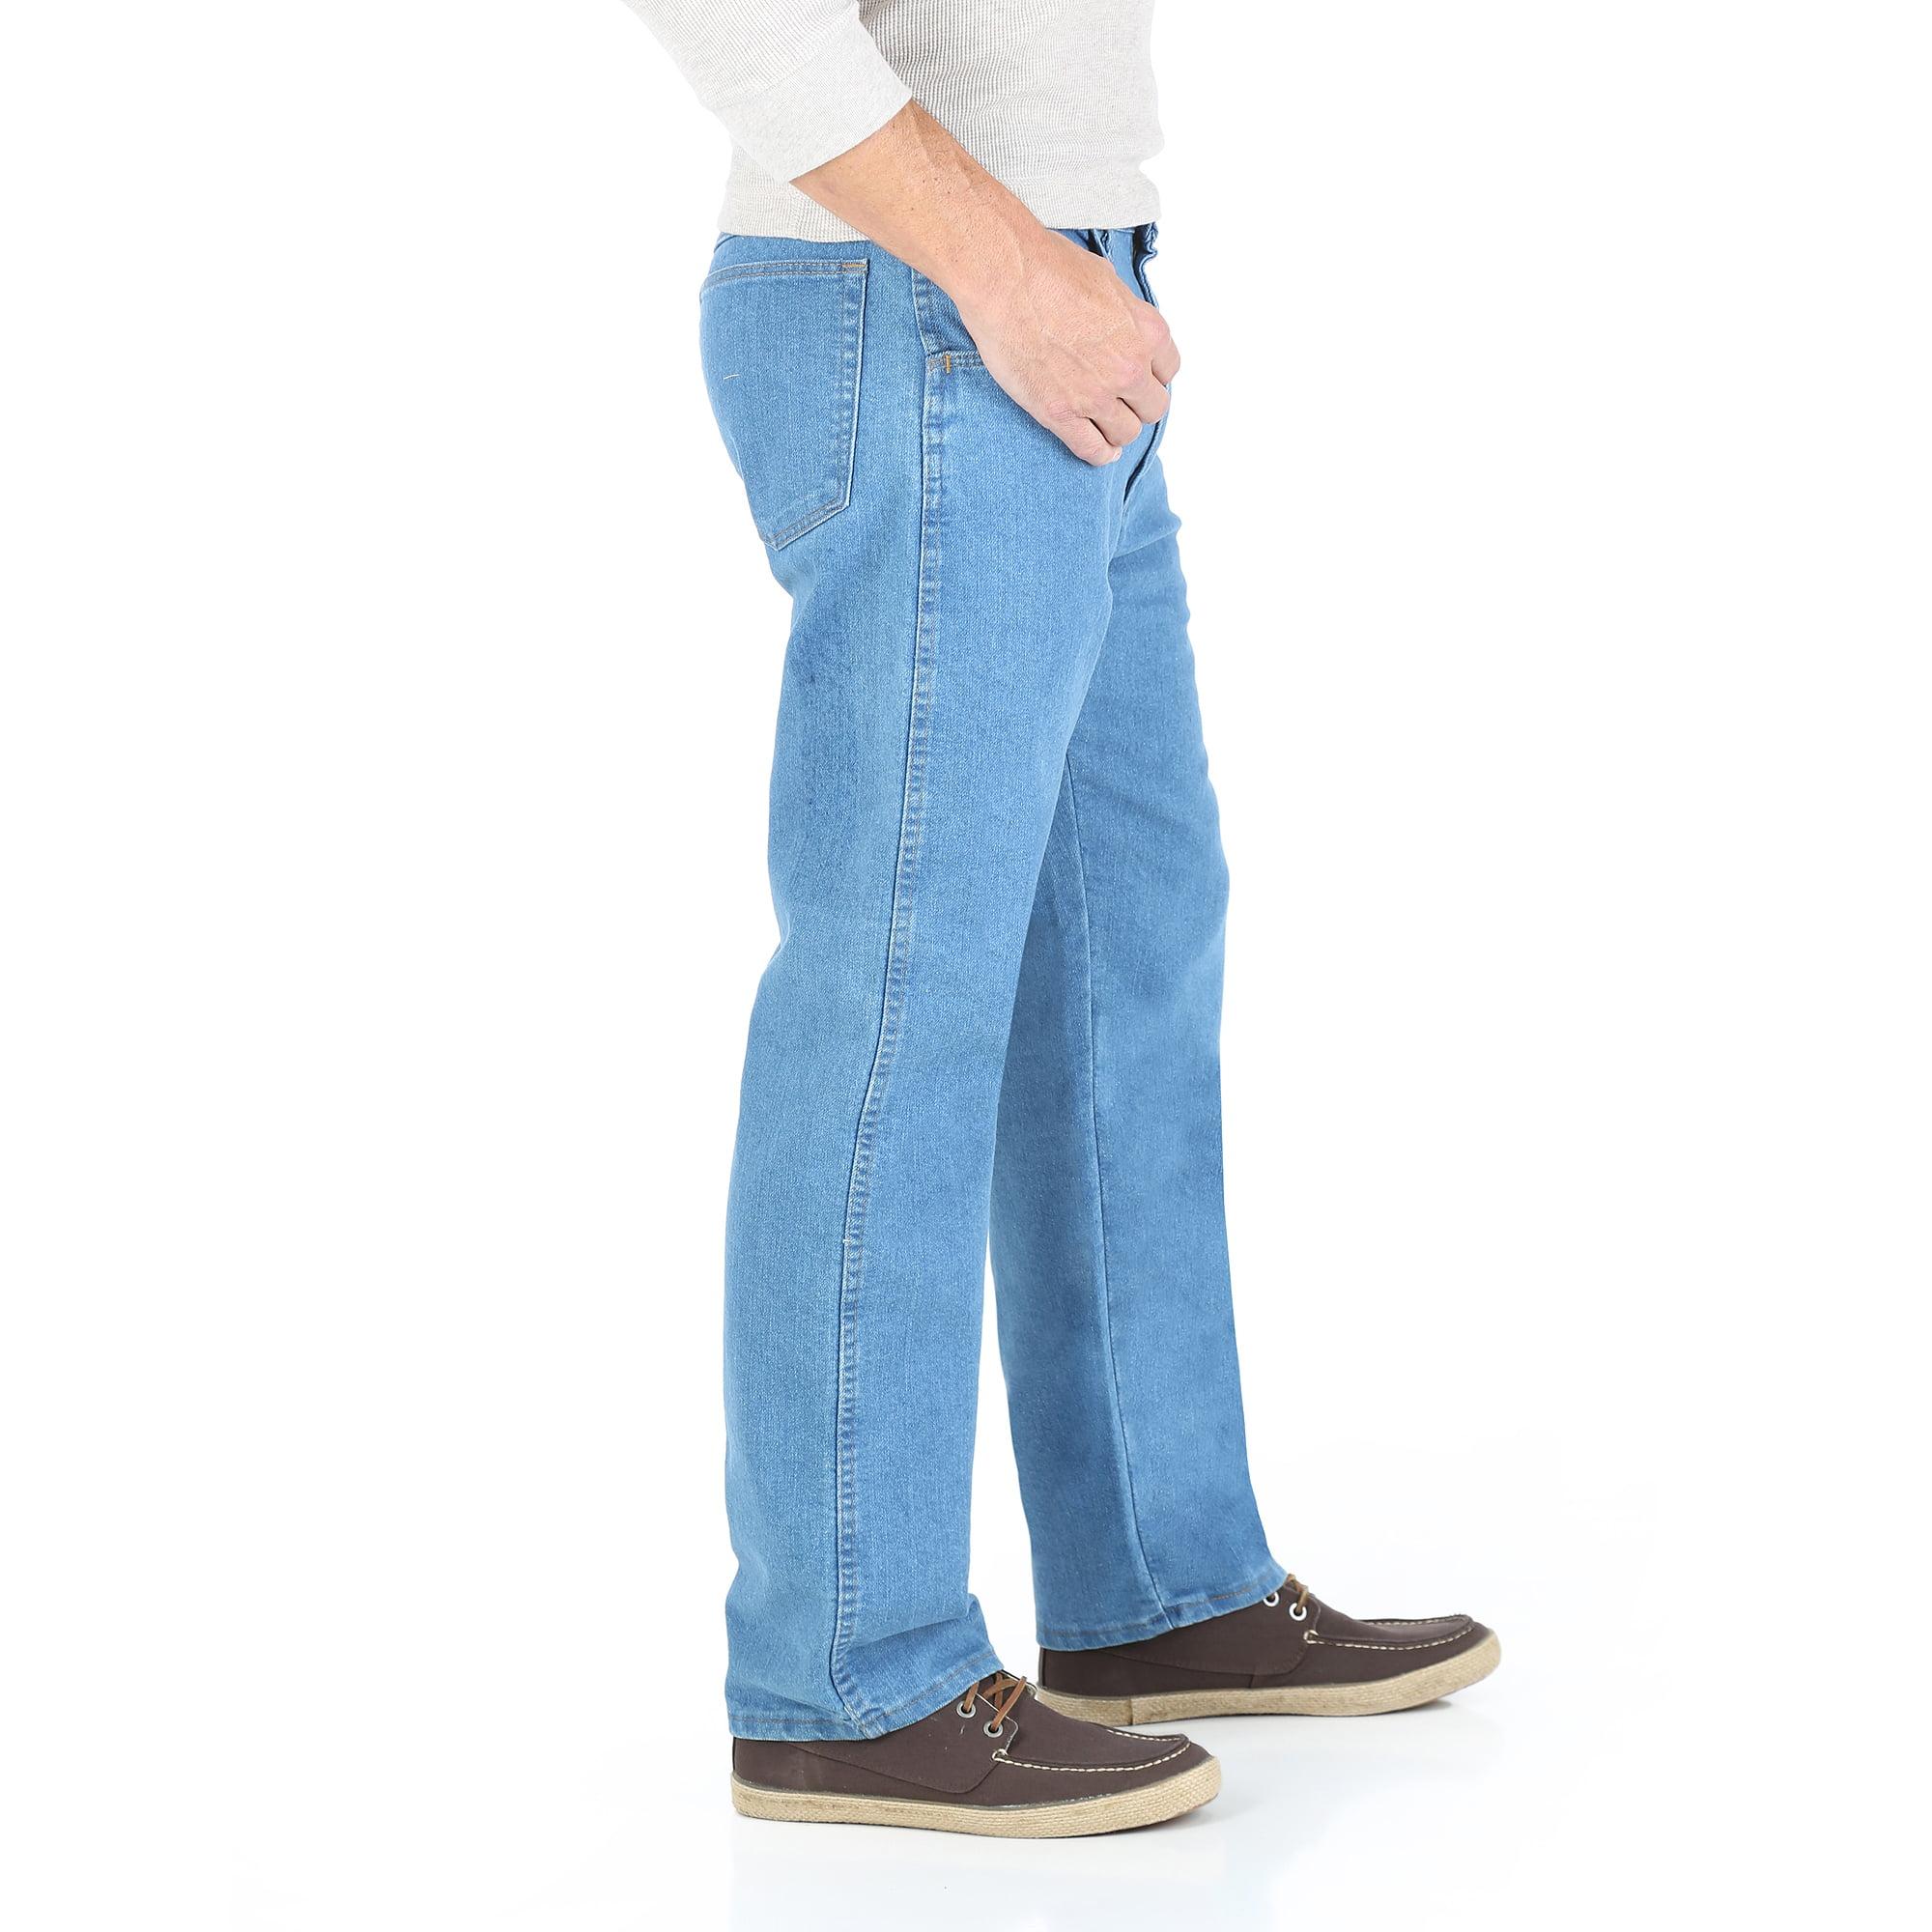 Wrangler bootcut jeans walmart